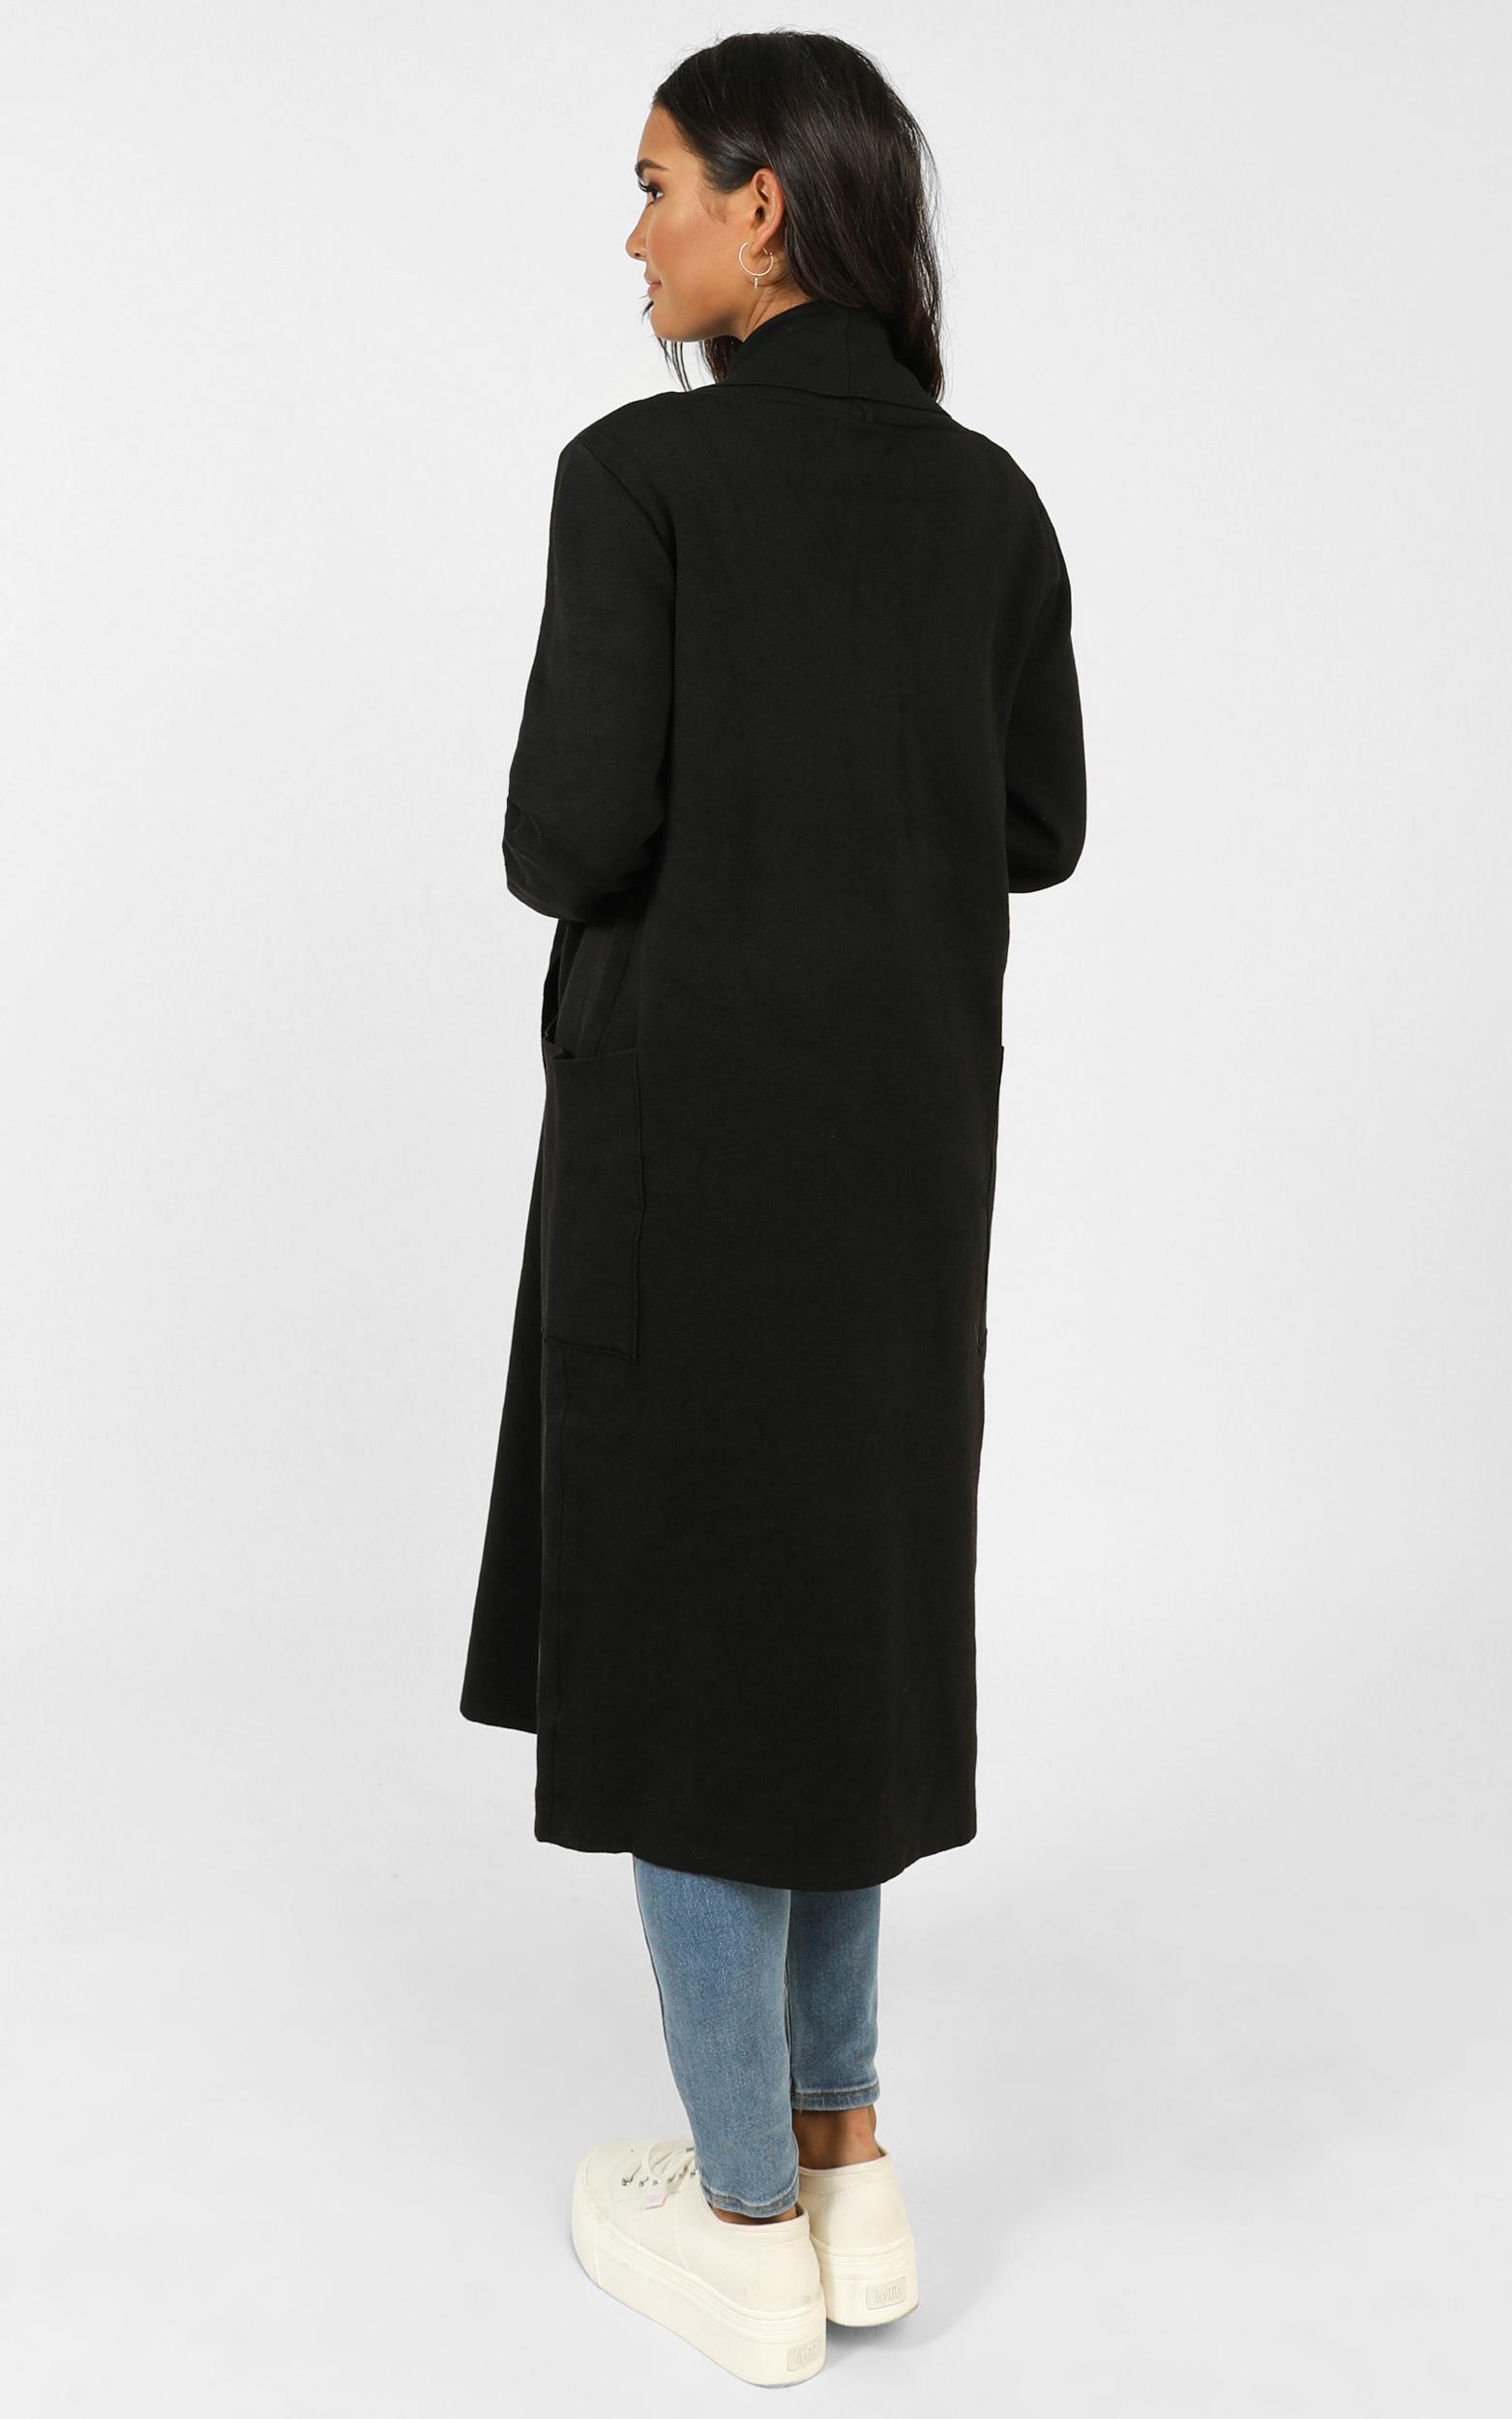 Around The World coat in black - M/L, Black, hi-res image number null